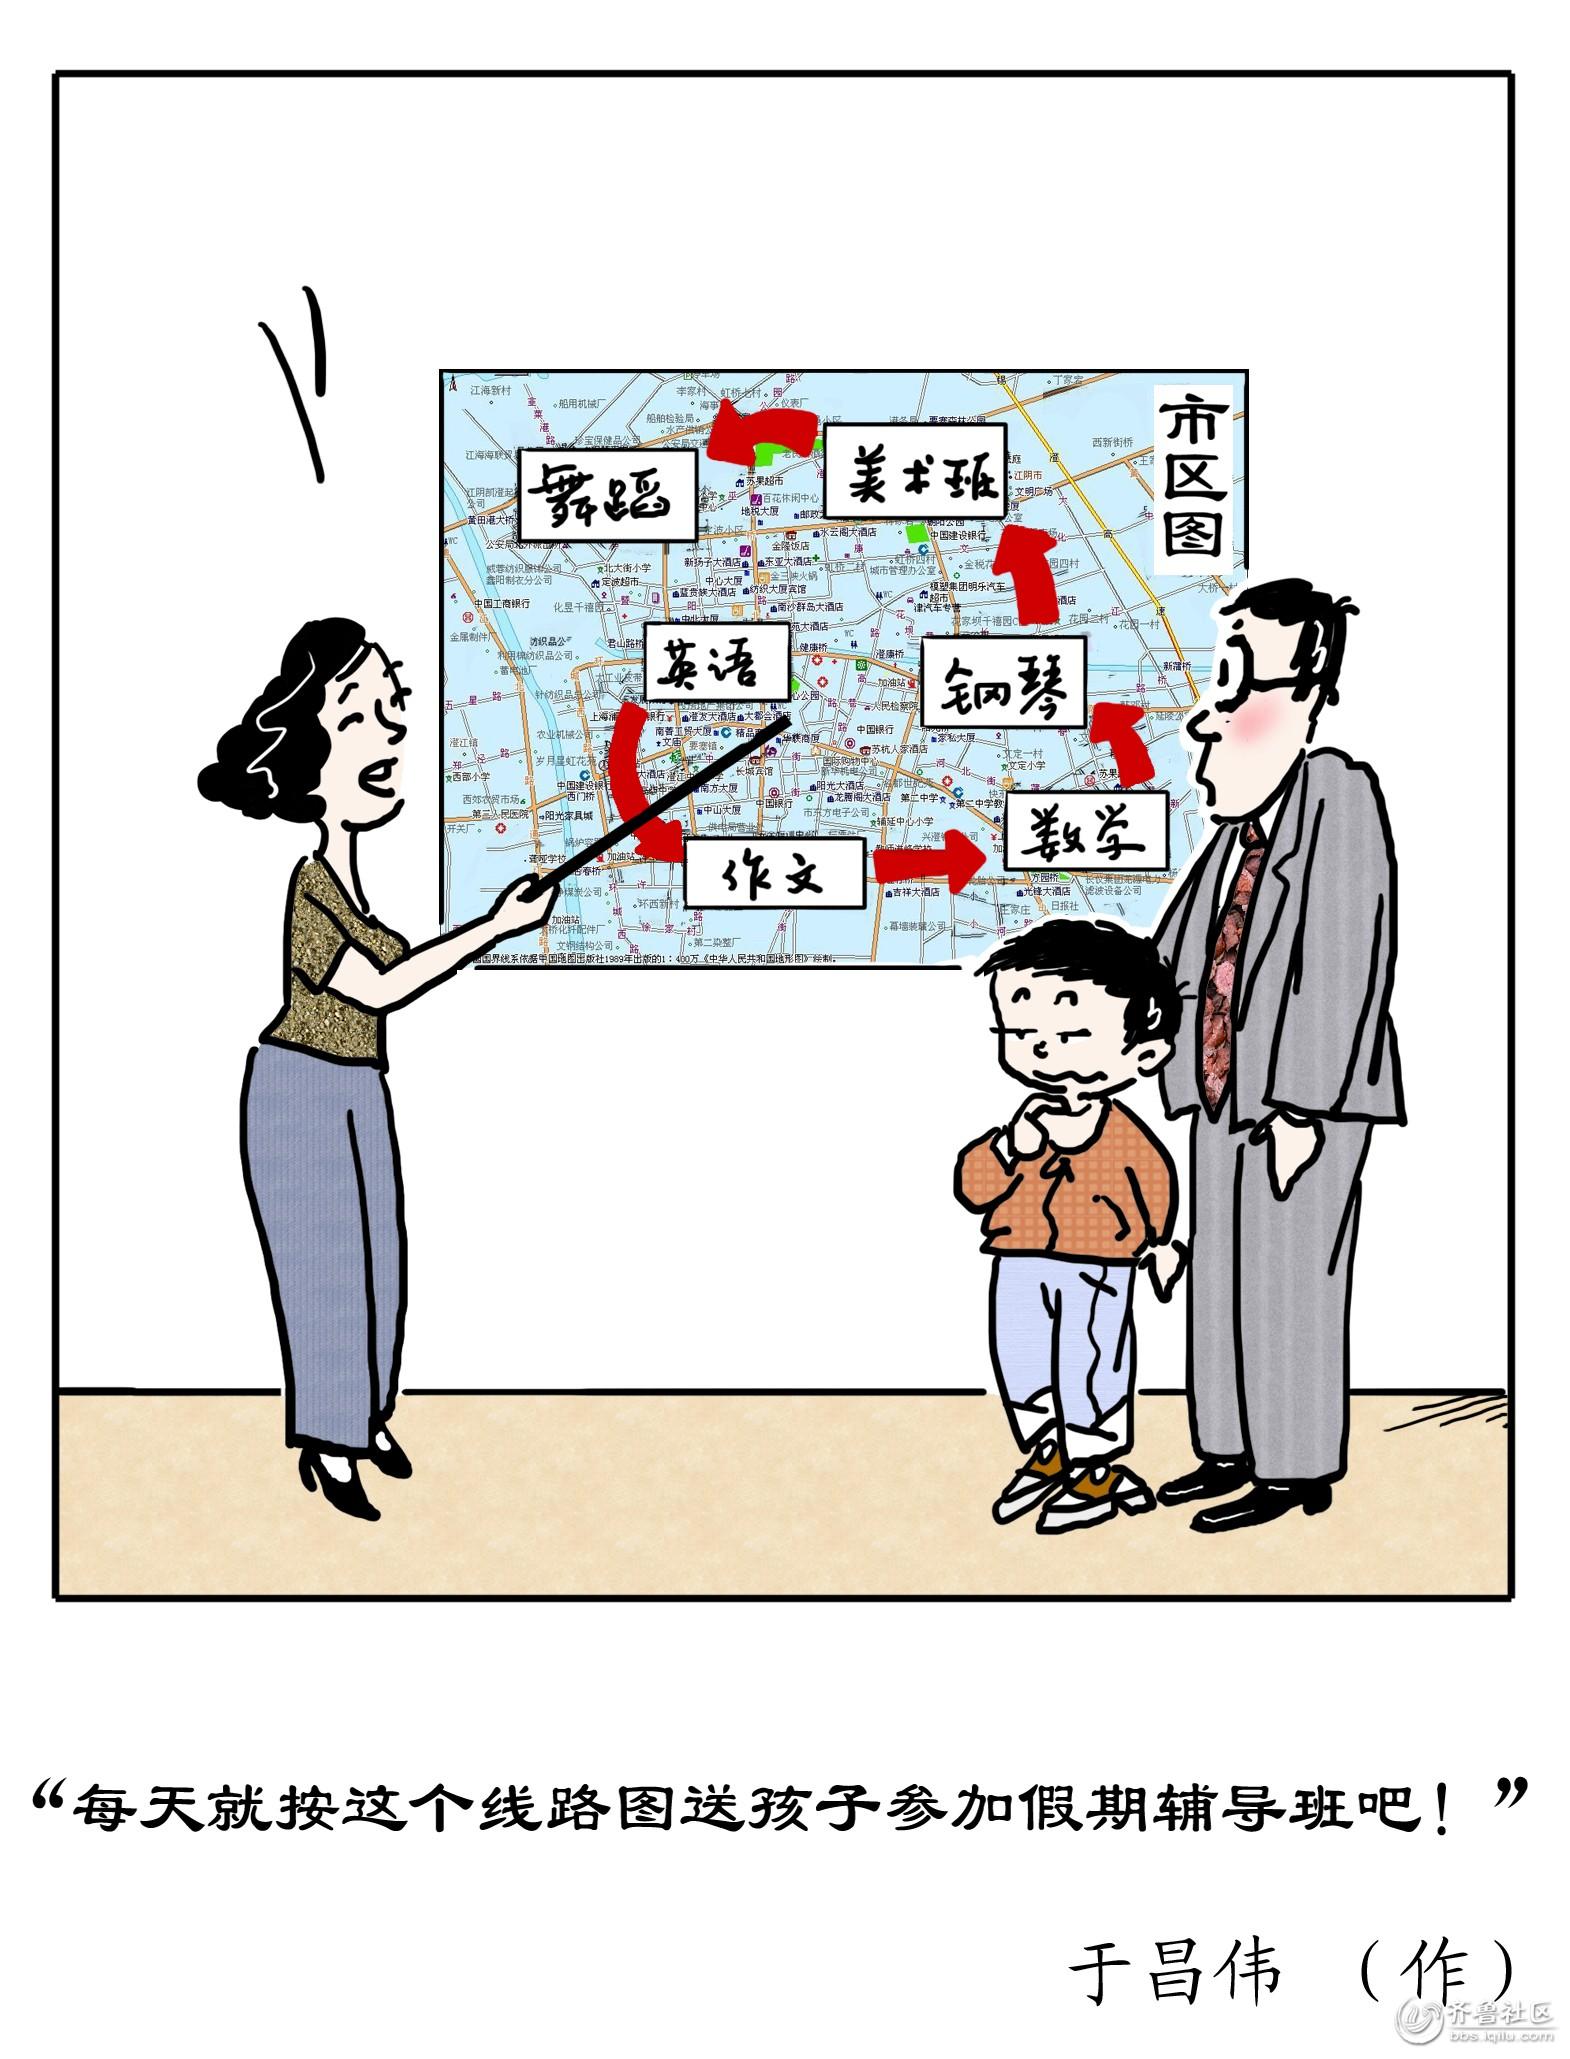 wb5漫画《线路图》.jpg